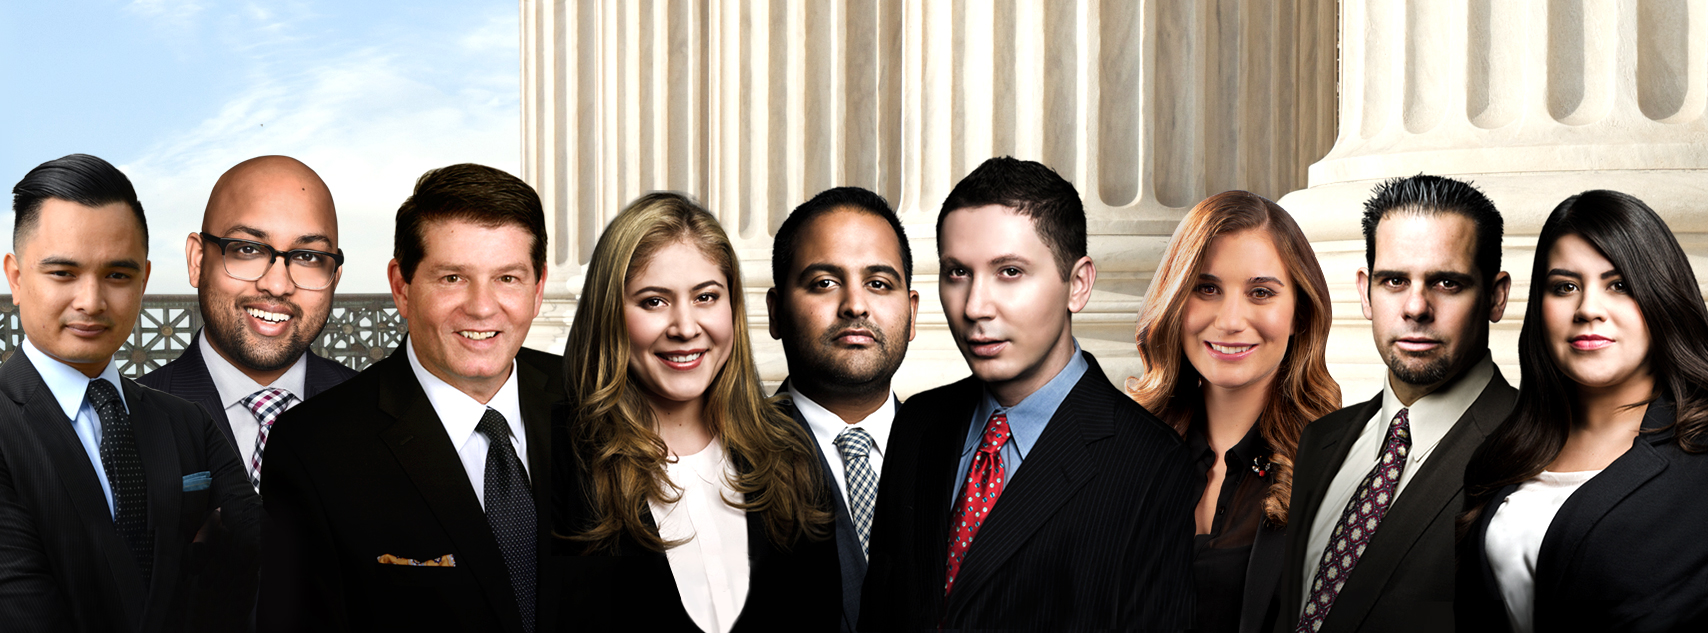 Shouse Law Group reviews | Criminal Defense Law at 16000 Ventura Blvd. - Encino CA